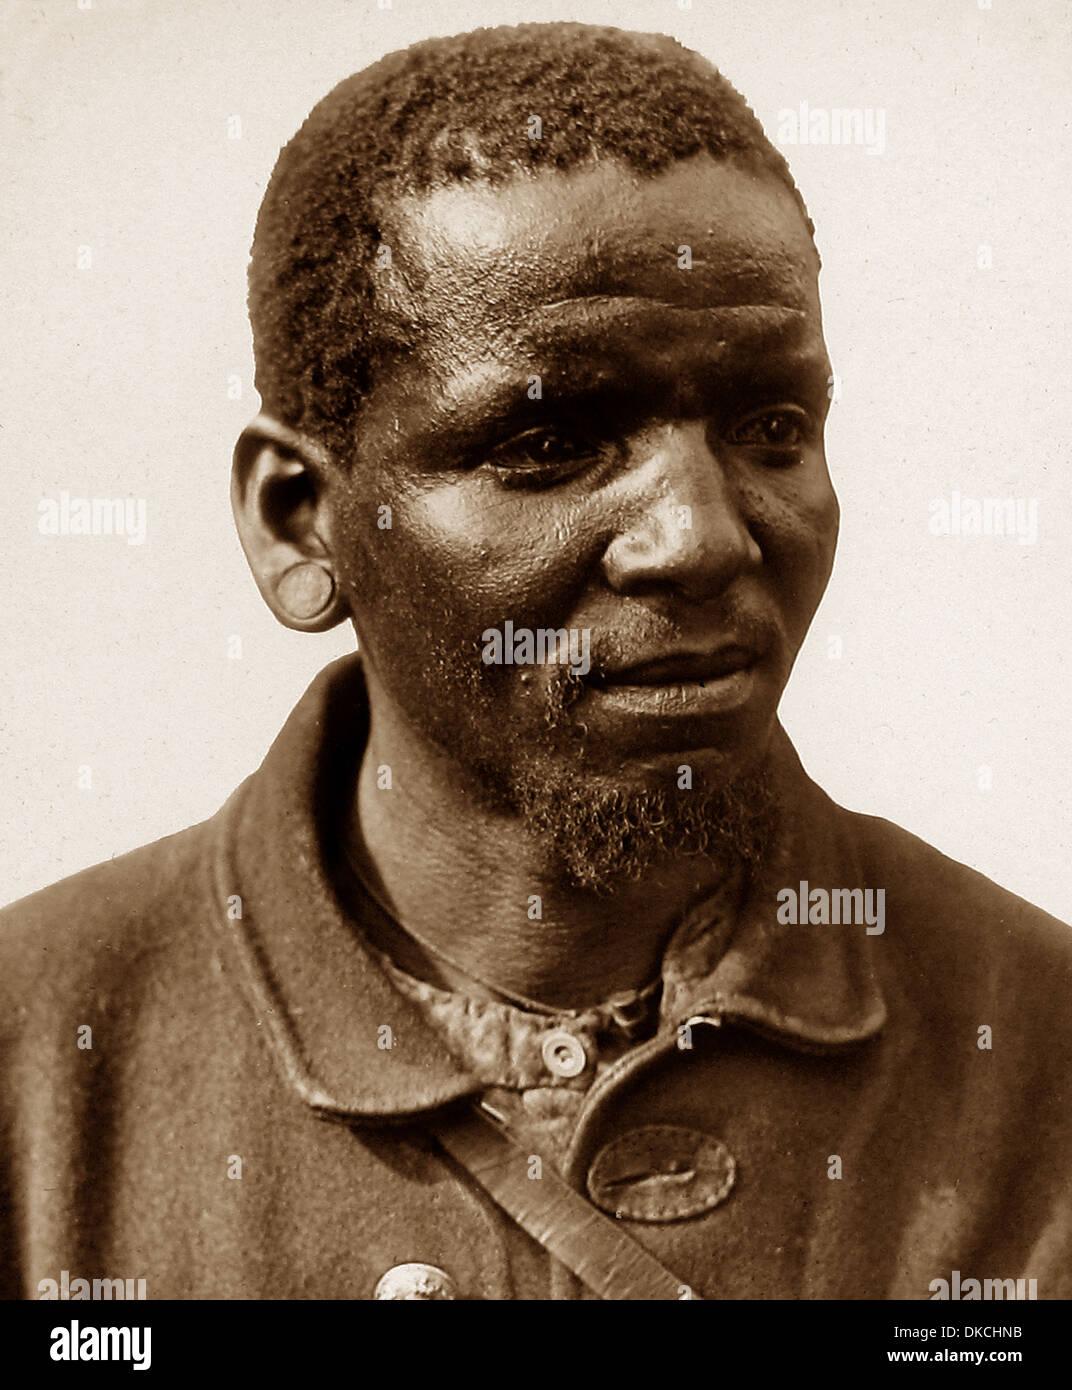 Africa Tock Boy pre-1900 - Stock Image